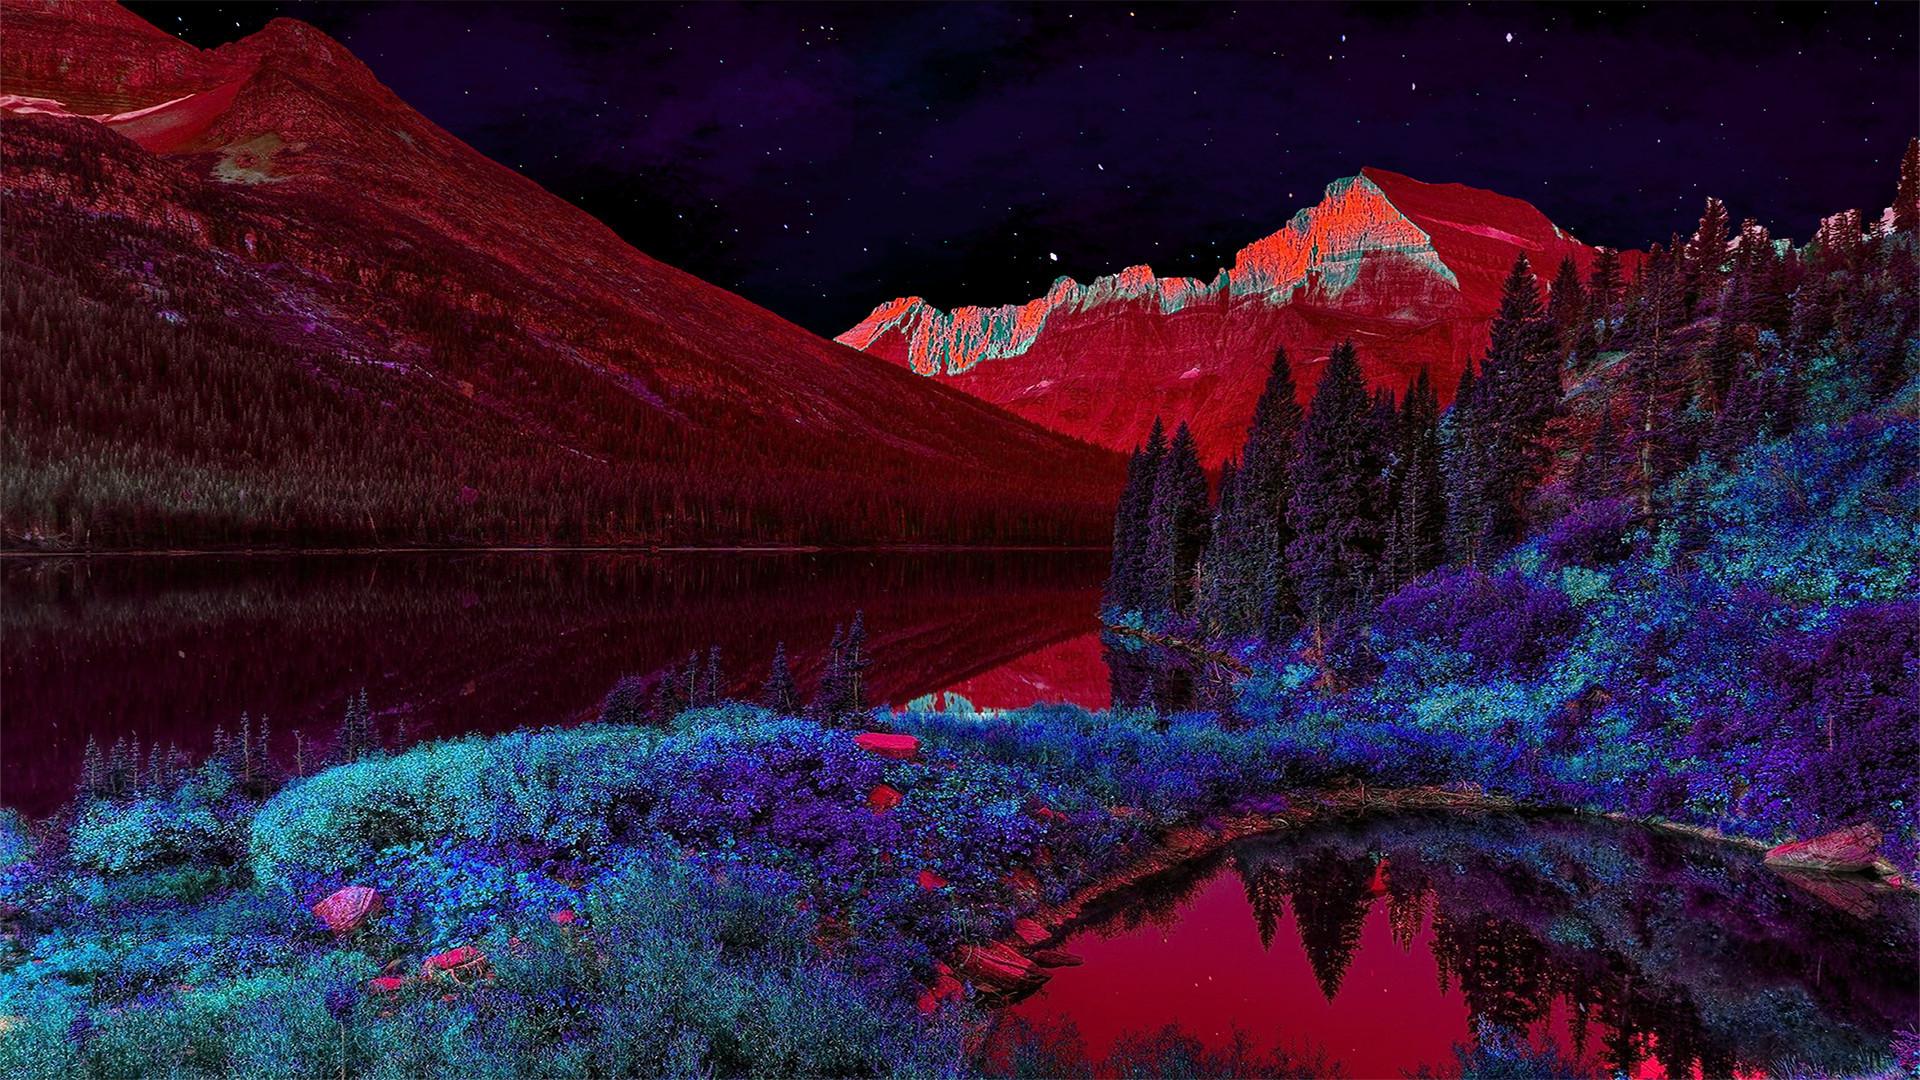 Trippy Landscape Wallpaper 70 Images